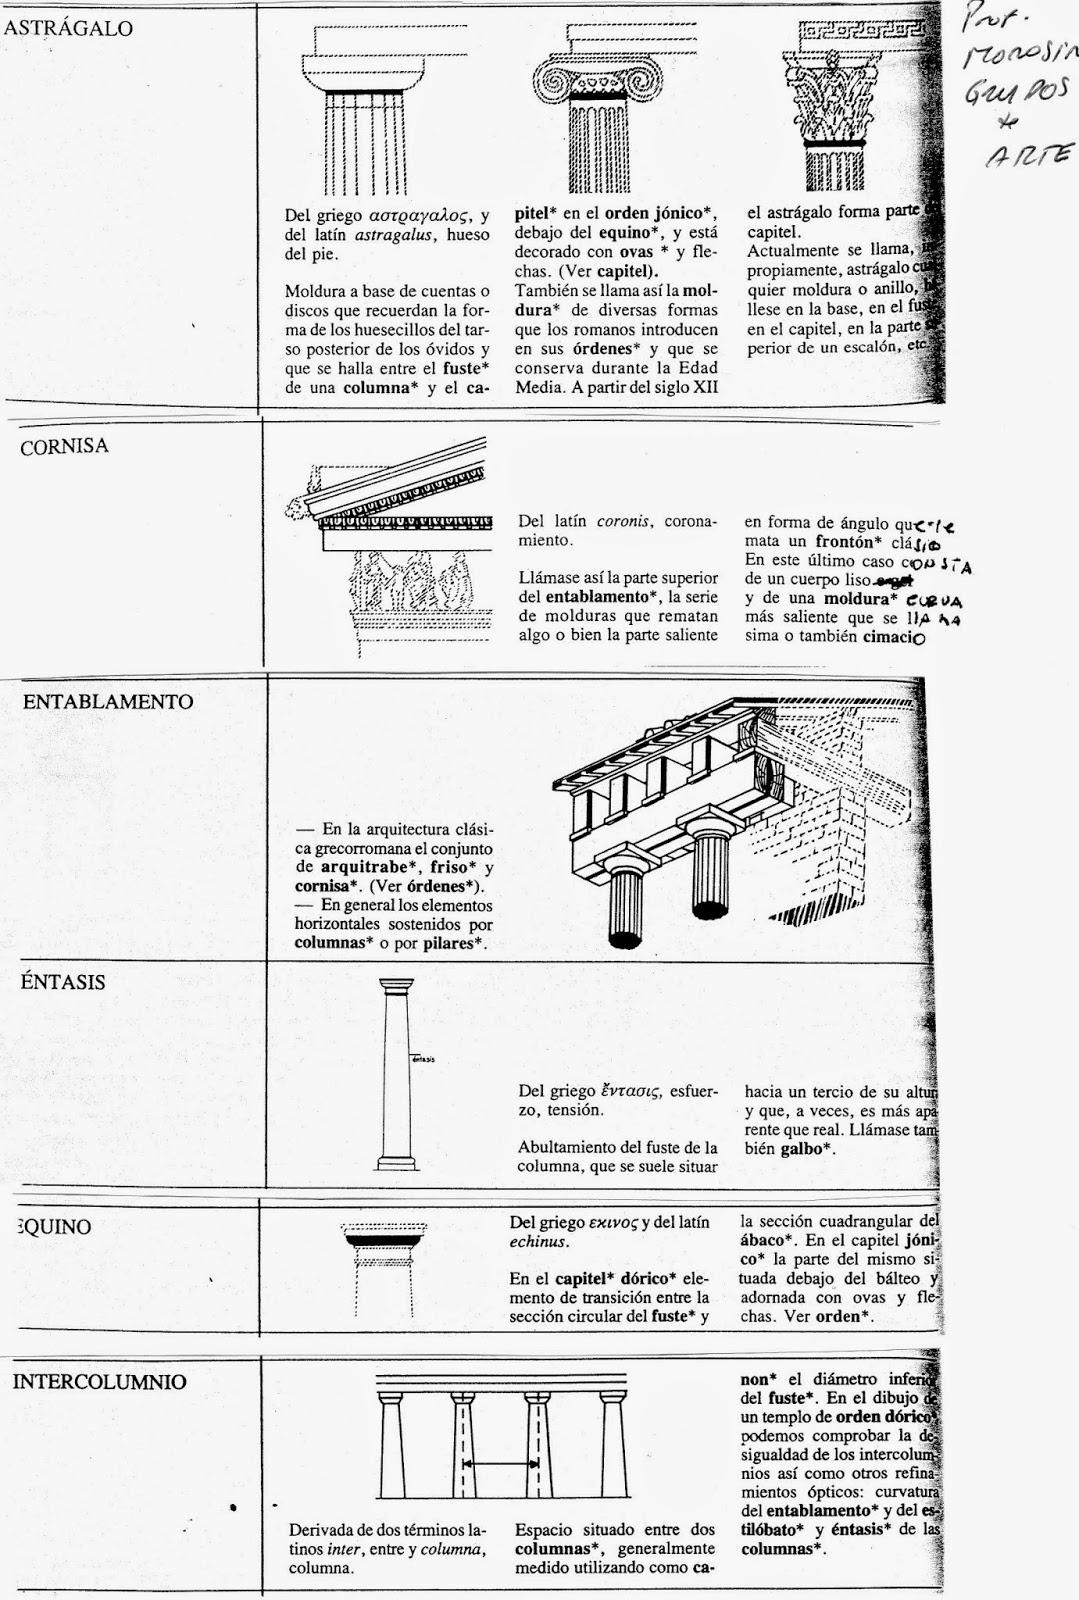 HISTORIA del ARTE Prof. Marco Morosini López: Grecia: Material extra ...